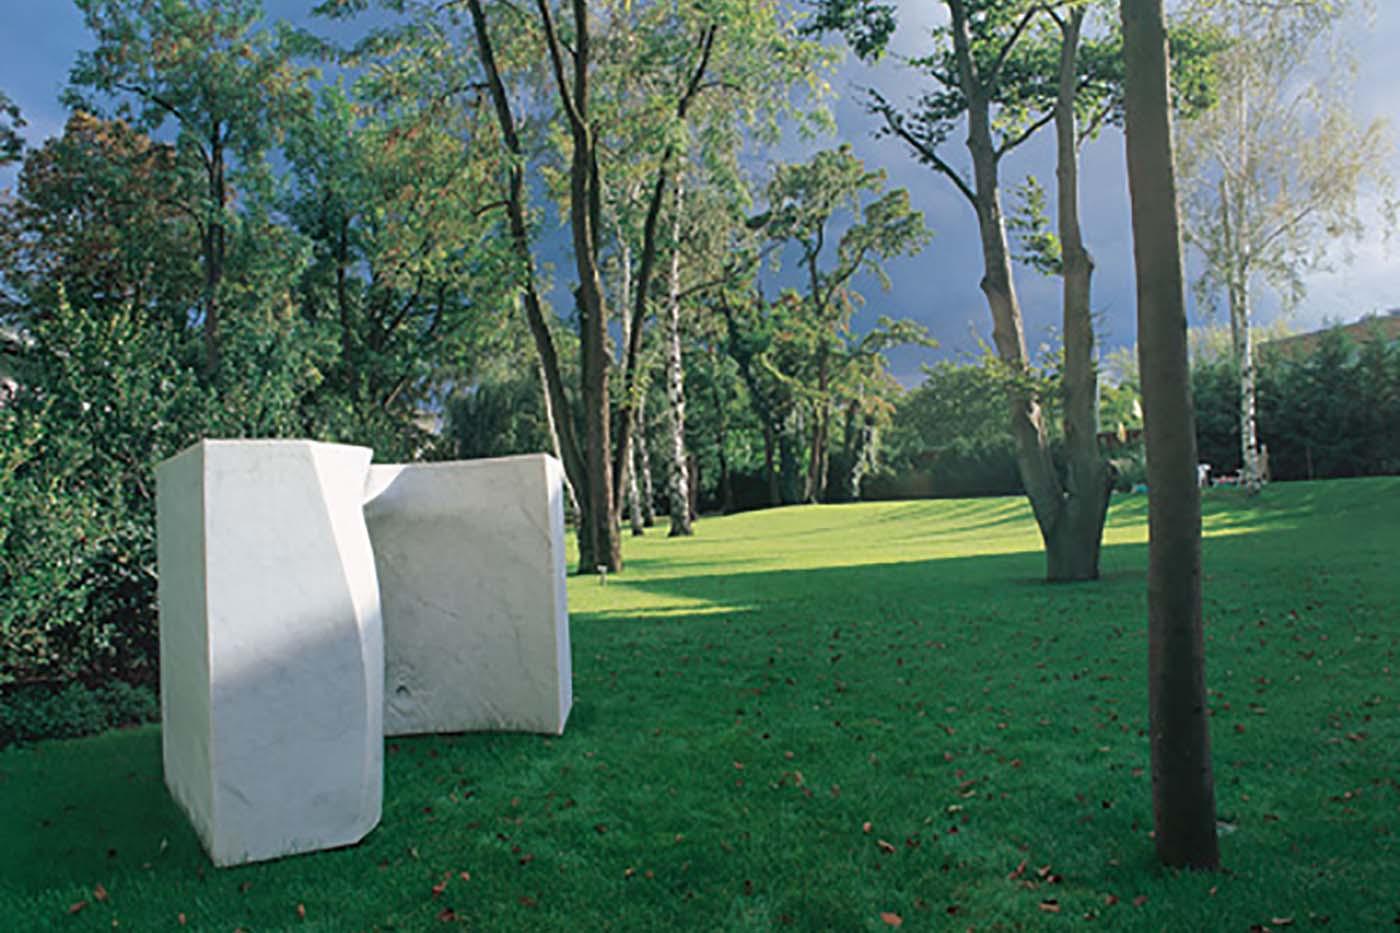 11_Grosser Wuerfel, Bianco Carrara [2000]